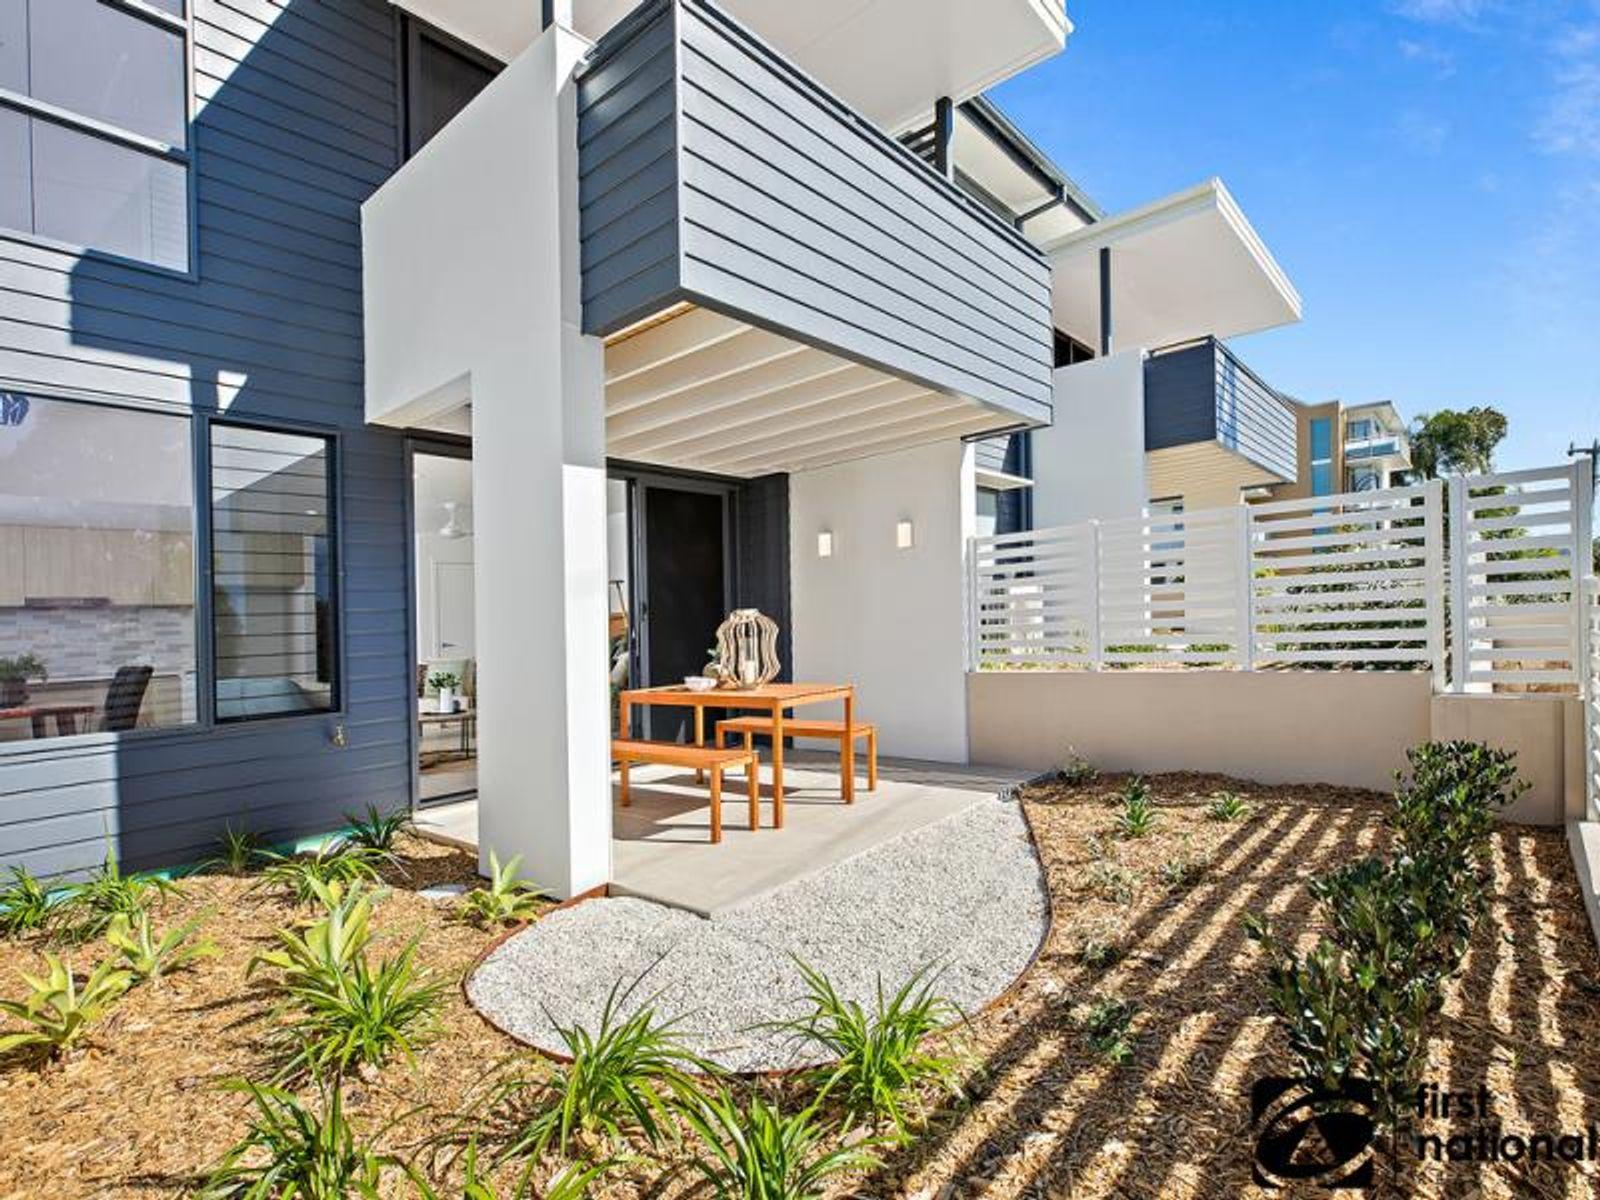 4/12 Dibbs Street, Coffs Harbour, NSW 2450